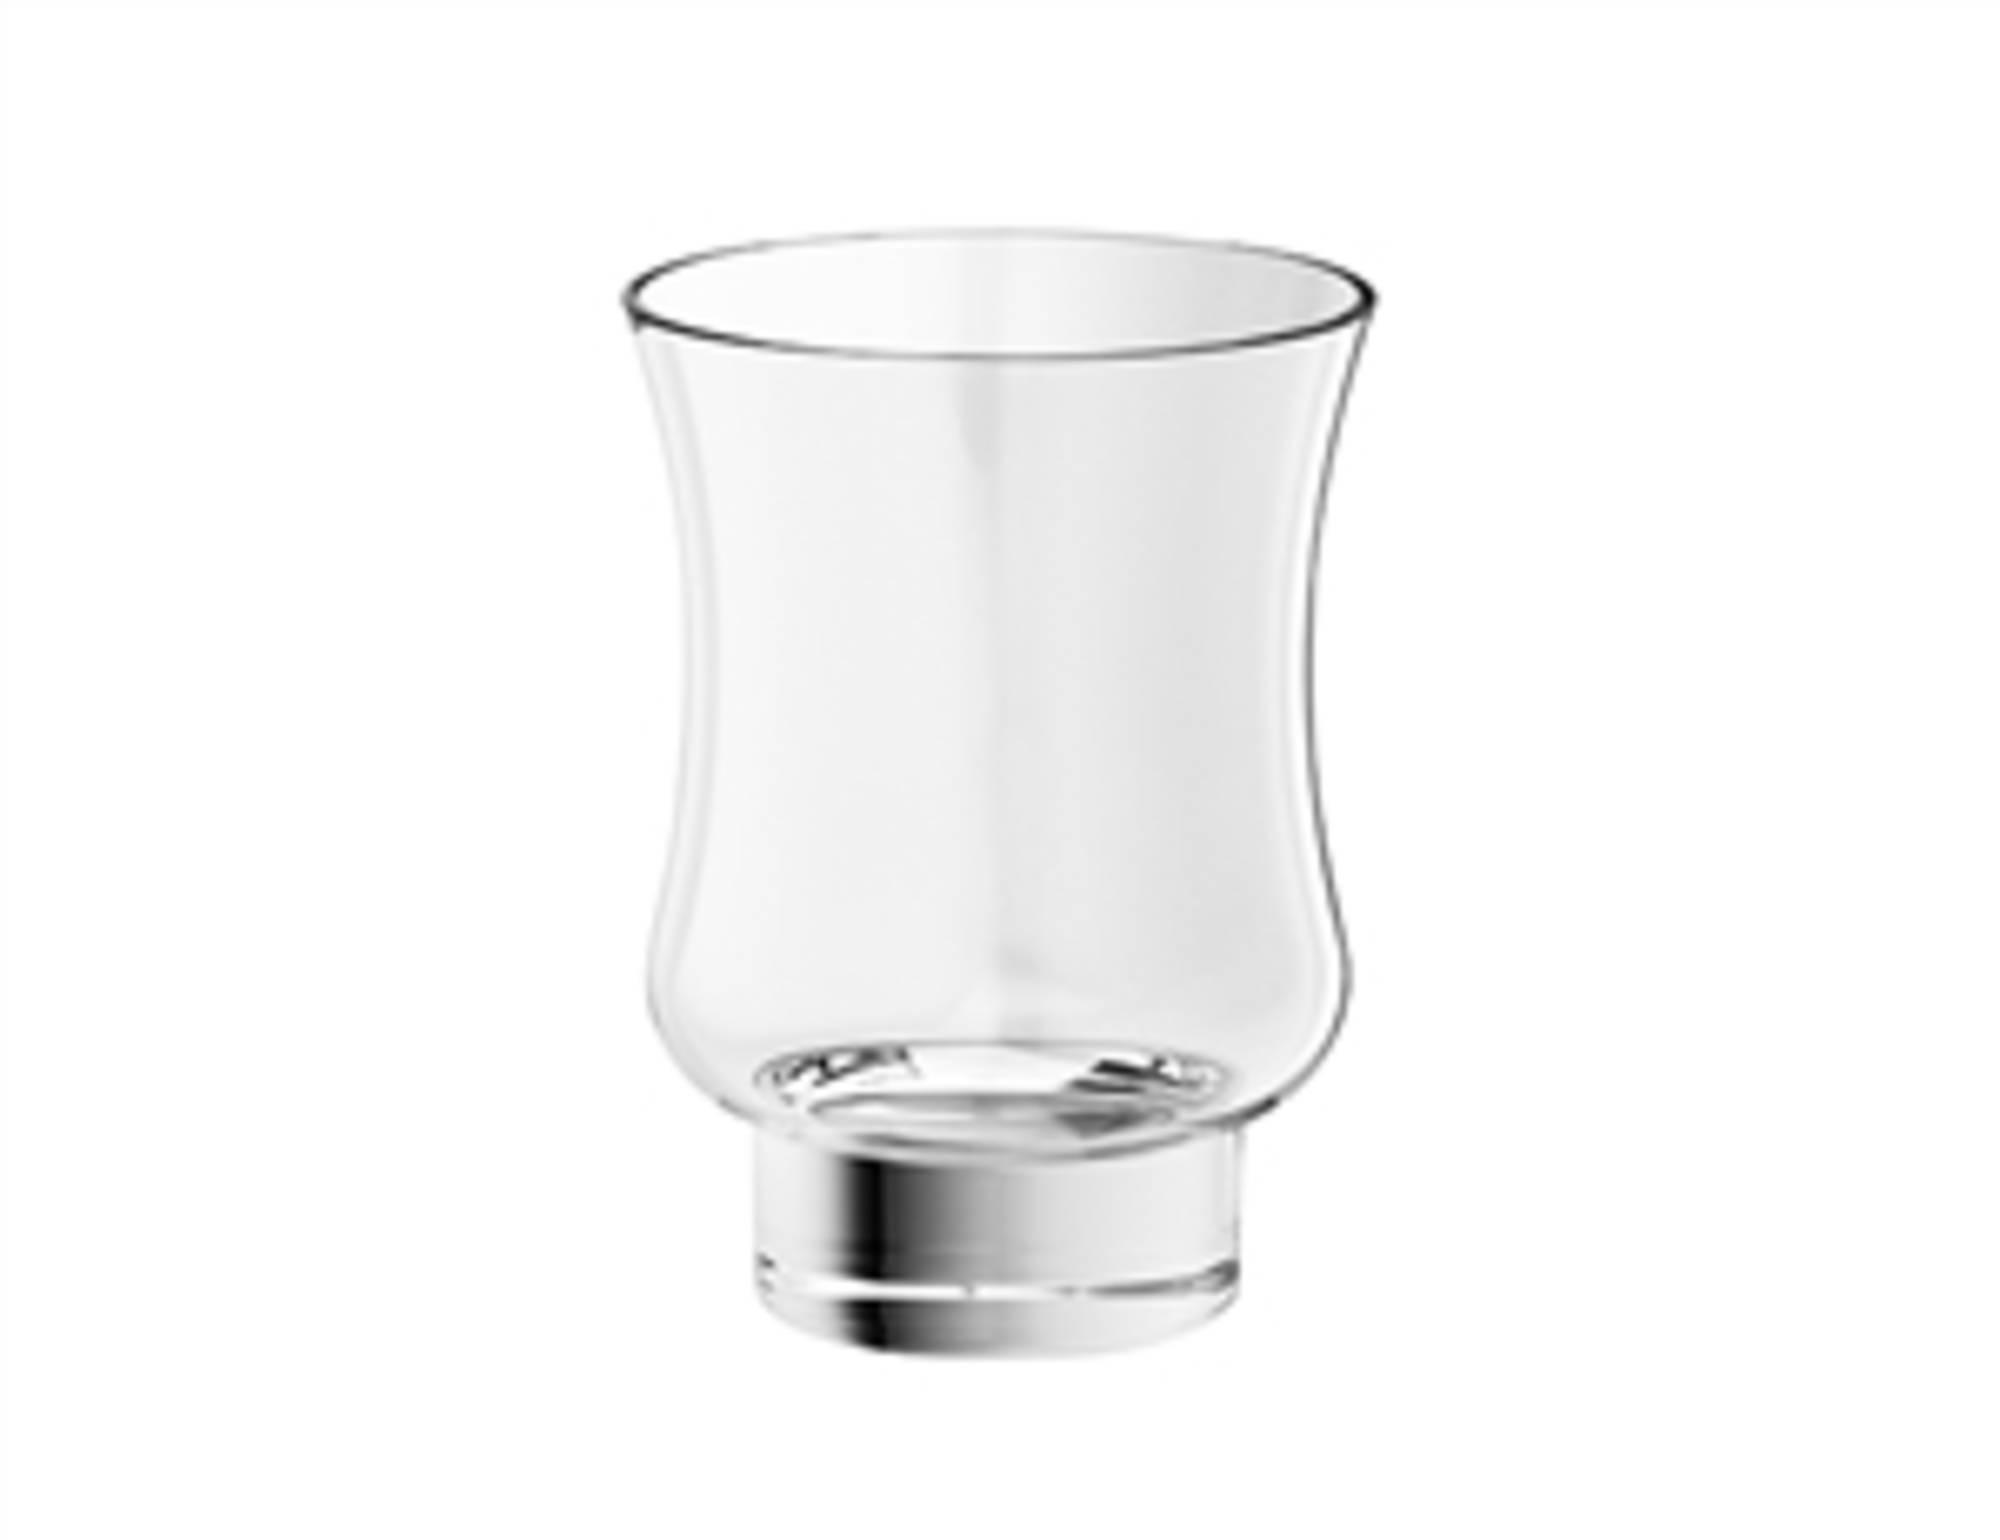 Glas voor glashouder